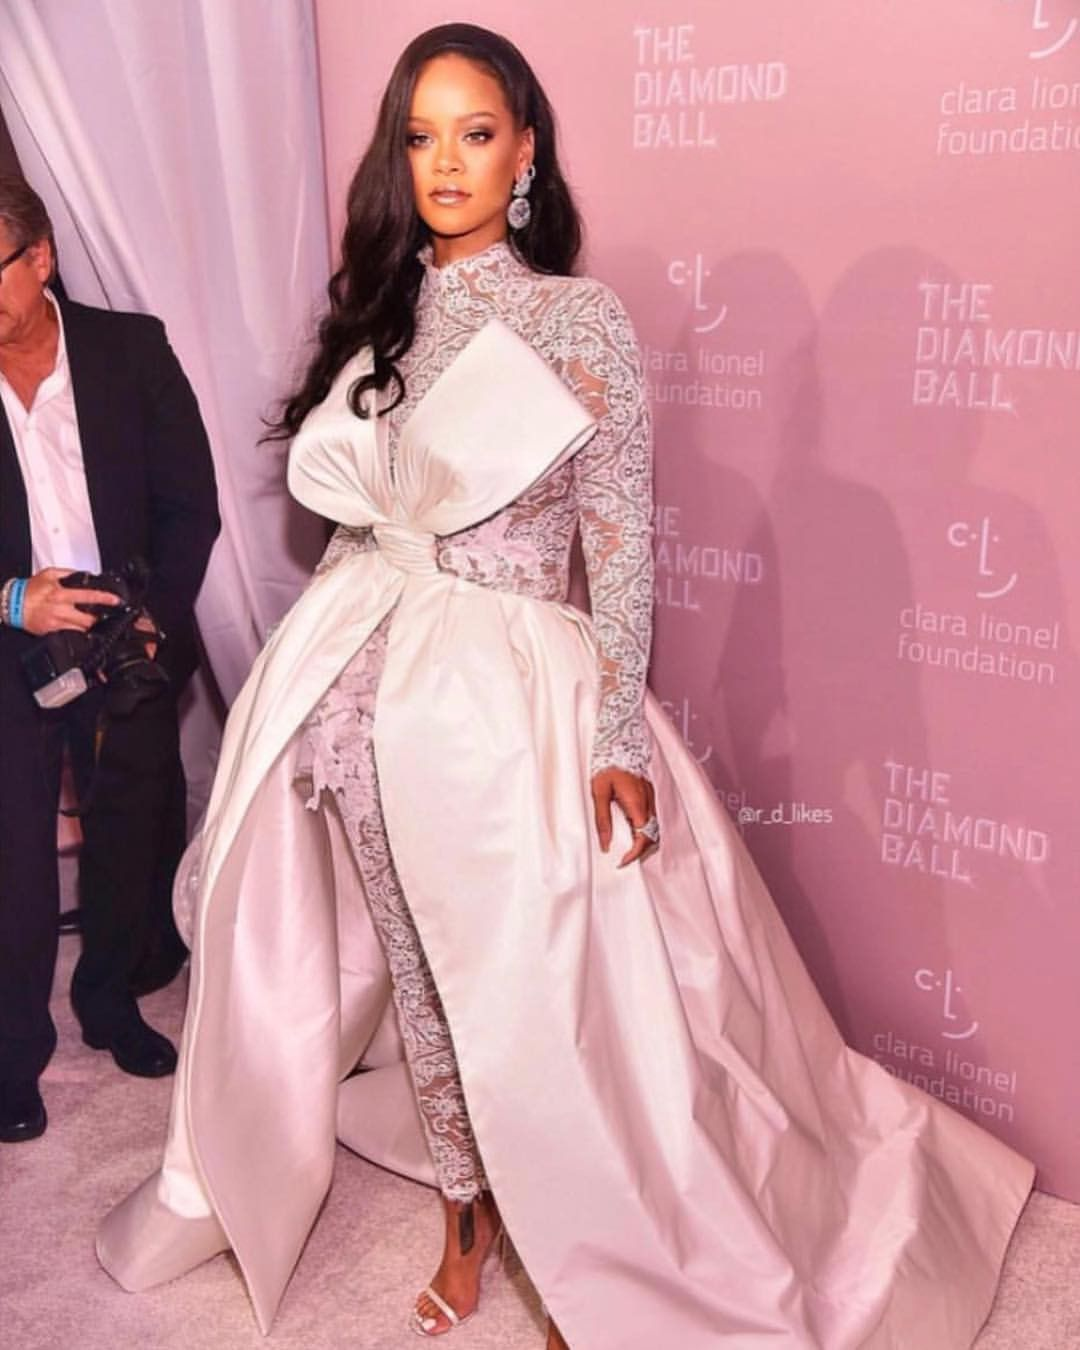 Pin by Sorella Paper Design on Beauty: Woman ♡ | Rihanna ...